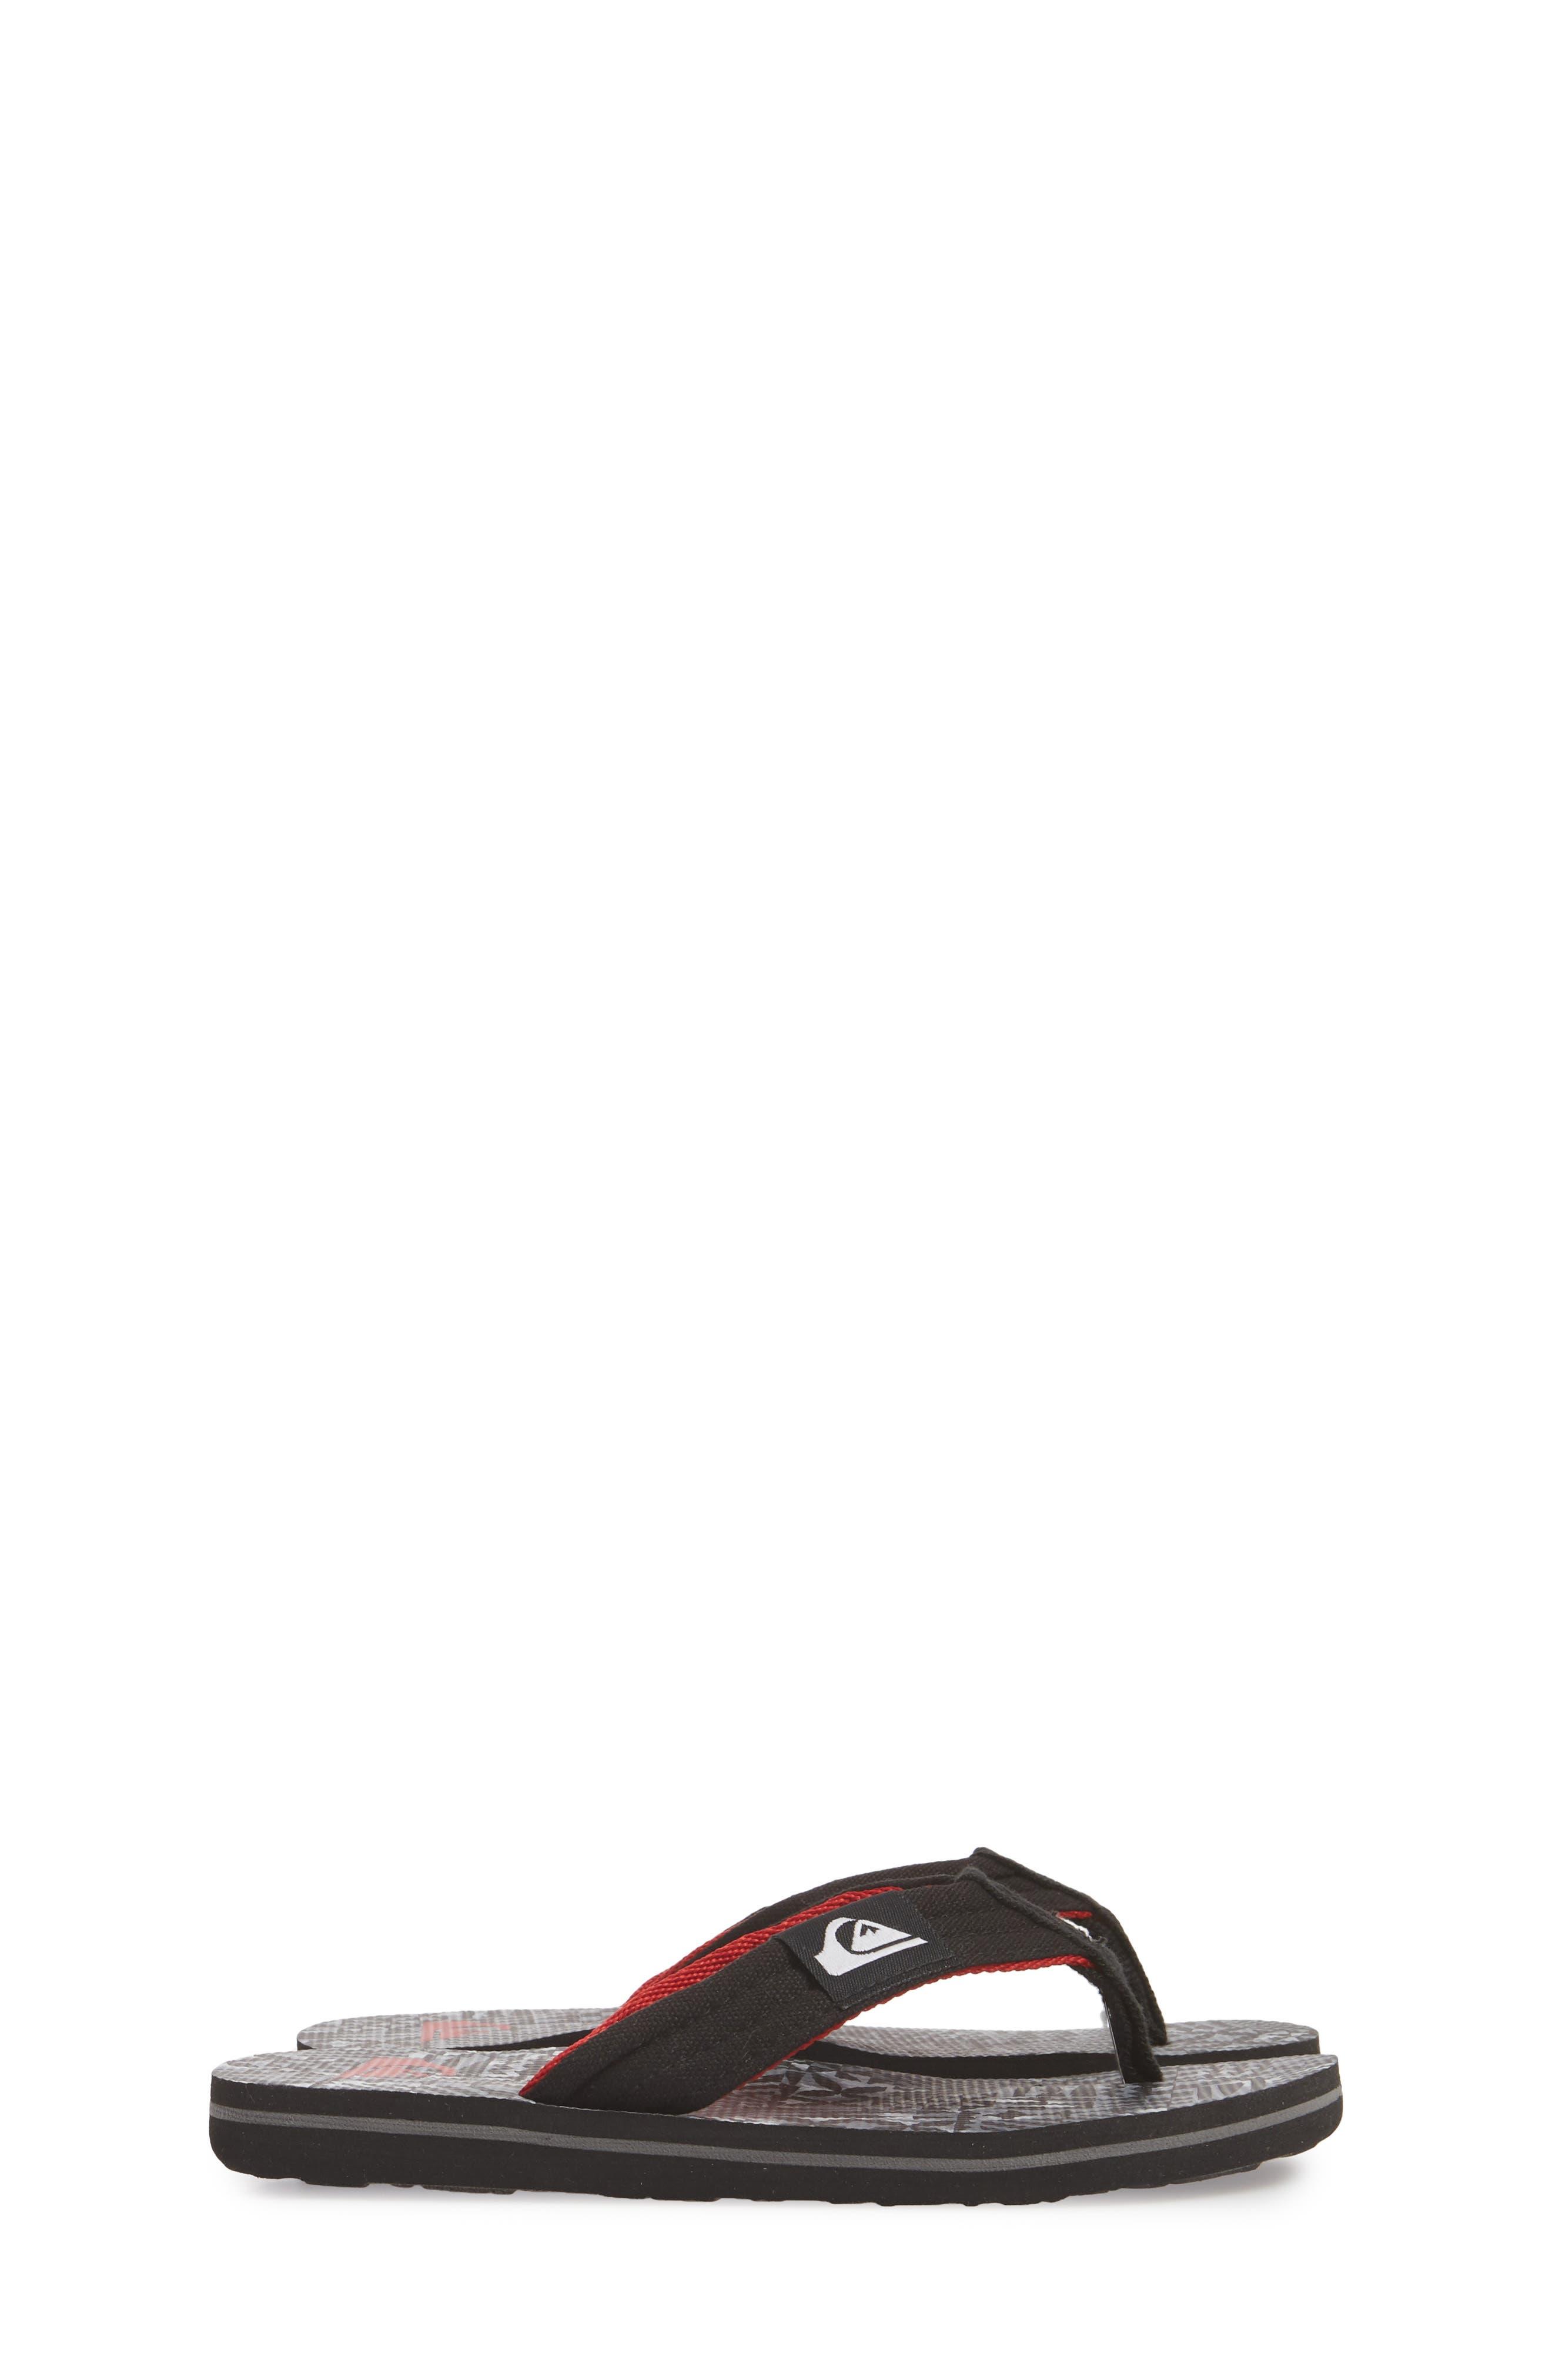 Alternate Image 4  - Quiksilver Molokai Layback Flip Flop (Toddler, Little Kid & Big Kid)